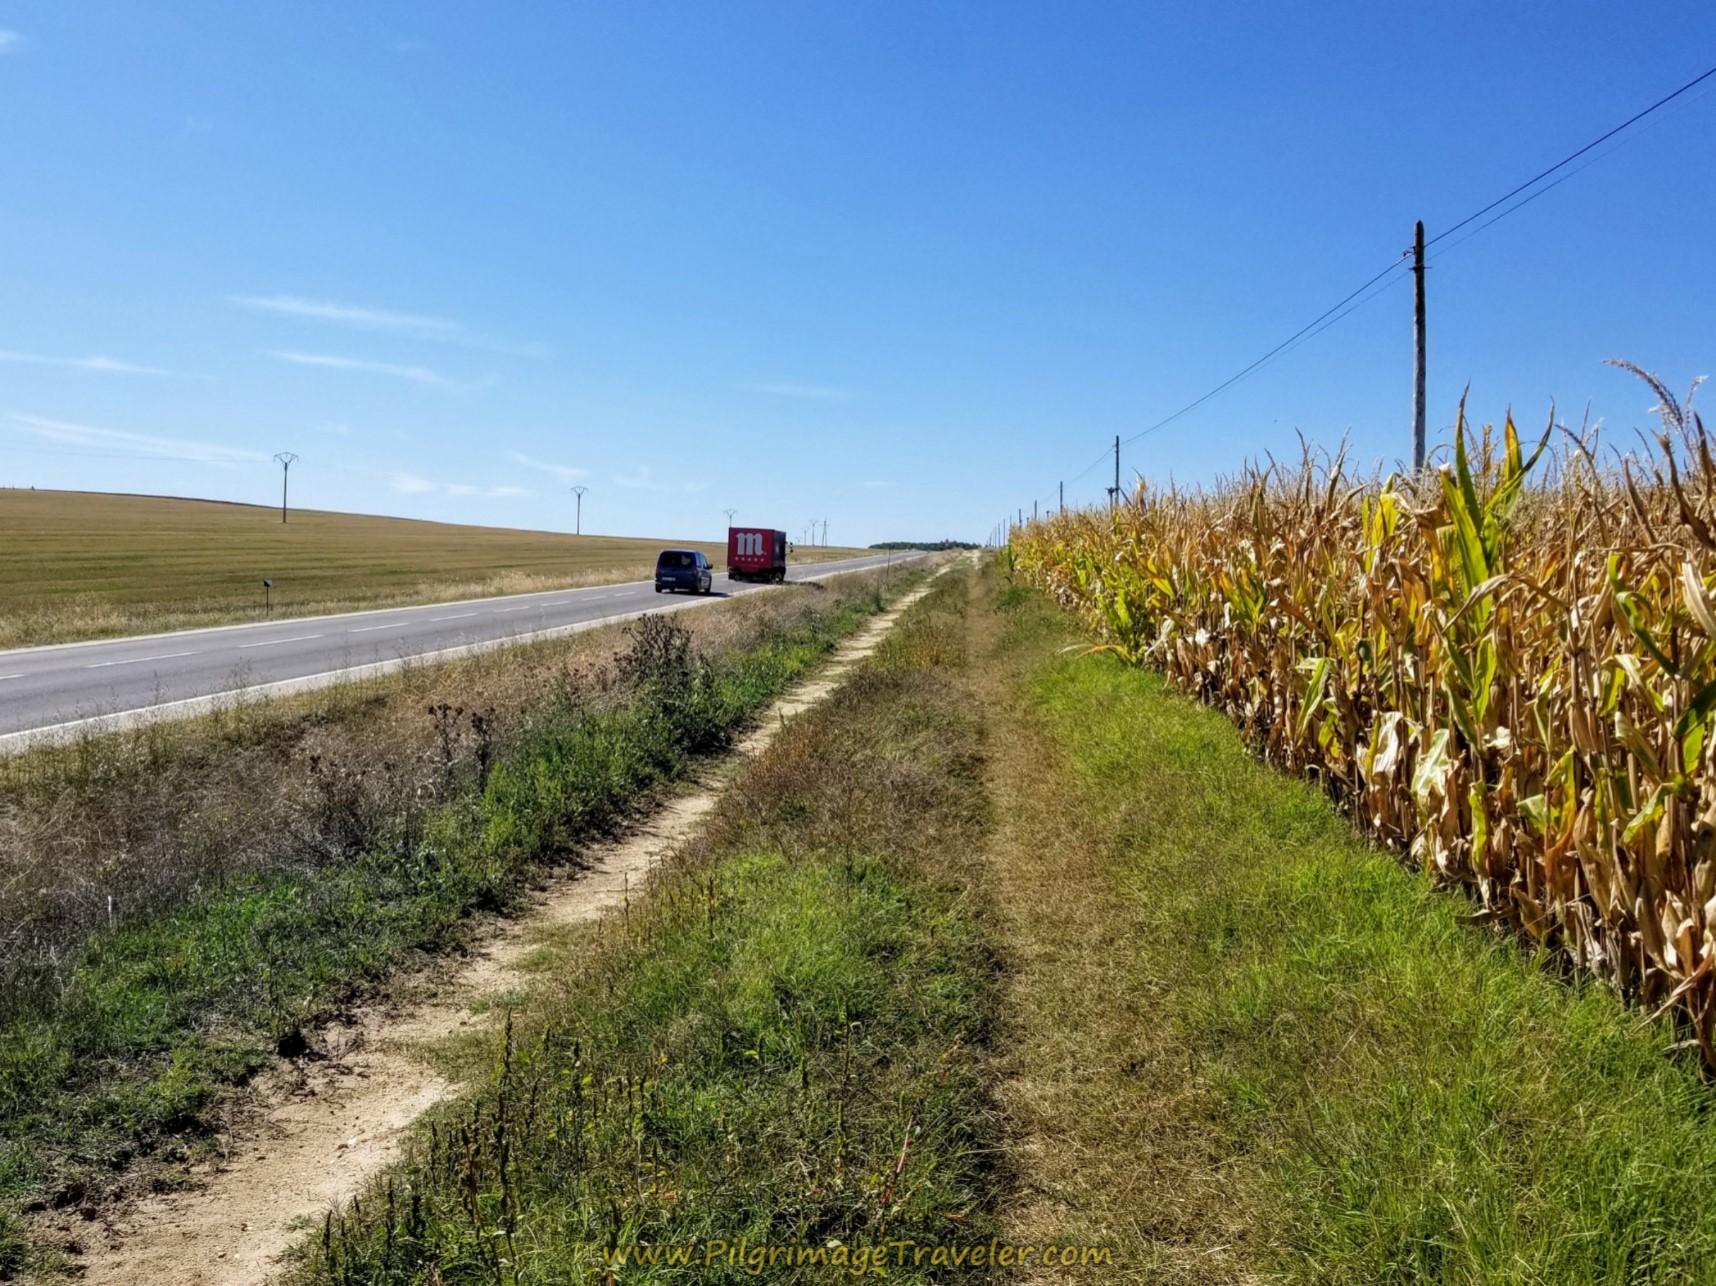 Sharing the Road to Alba de Tormes